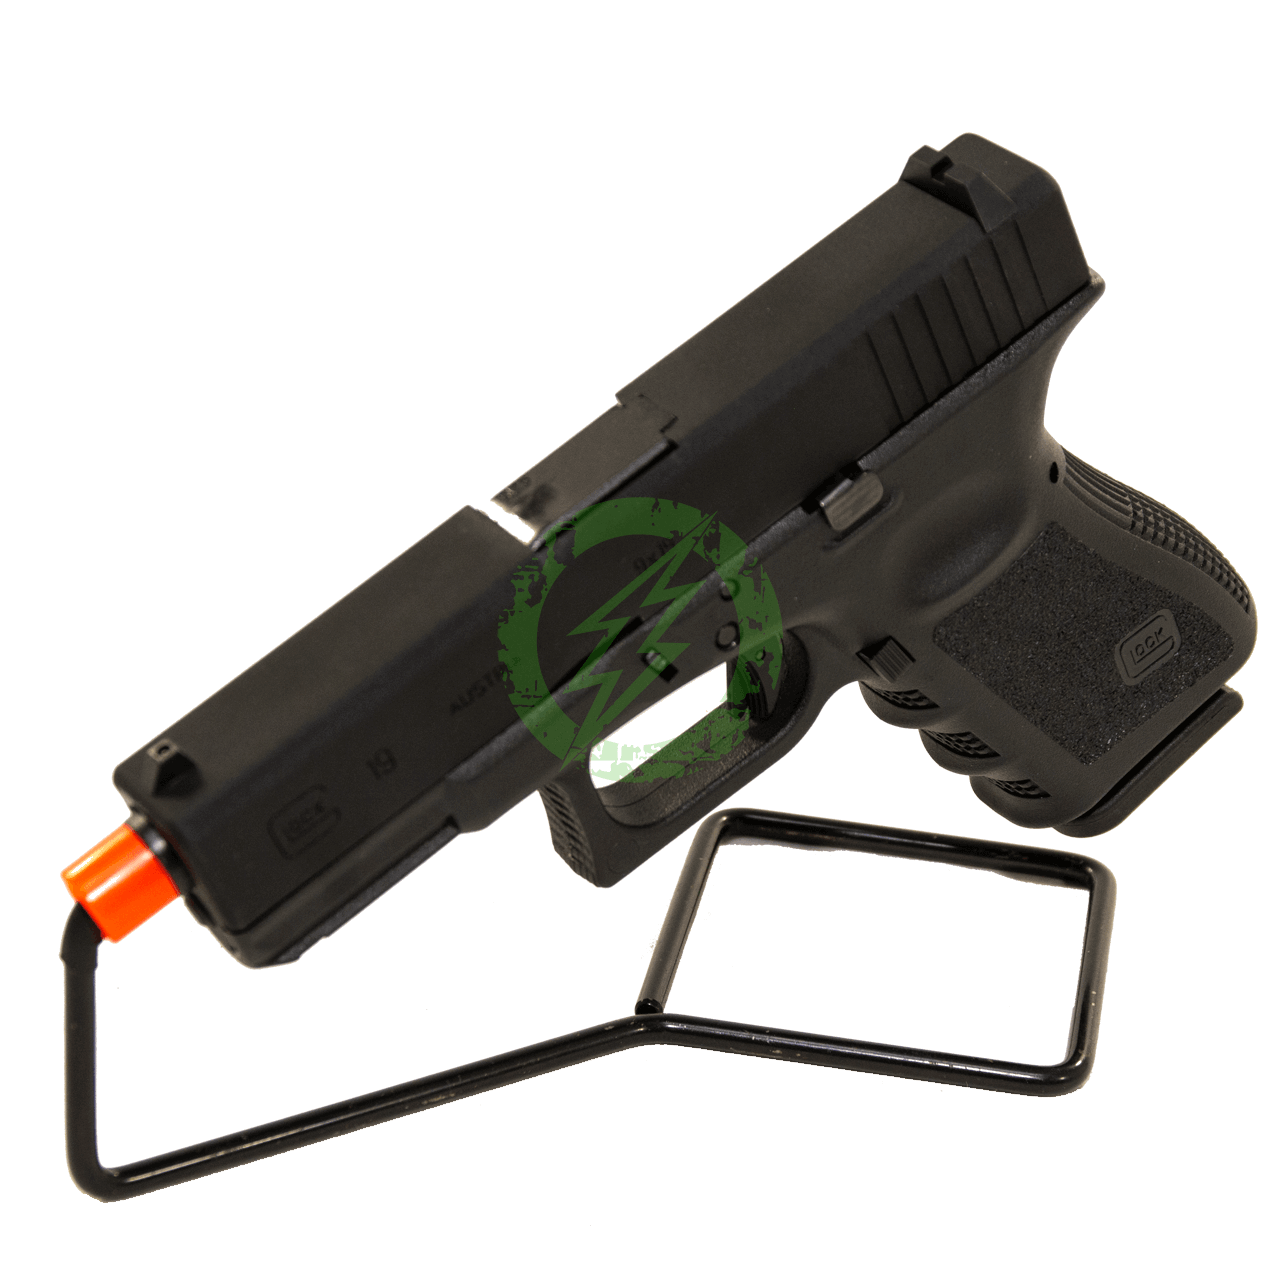 Umarex Elite Force Glock G19 GEN 3 GBB (Black)